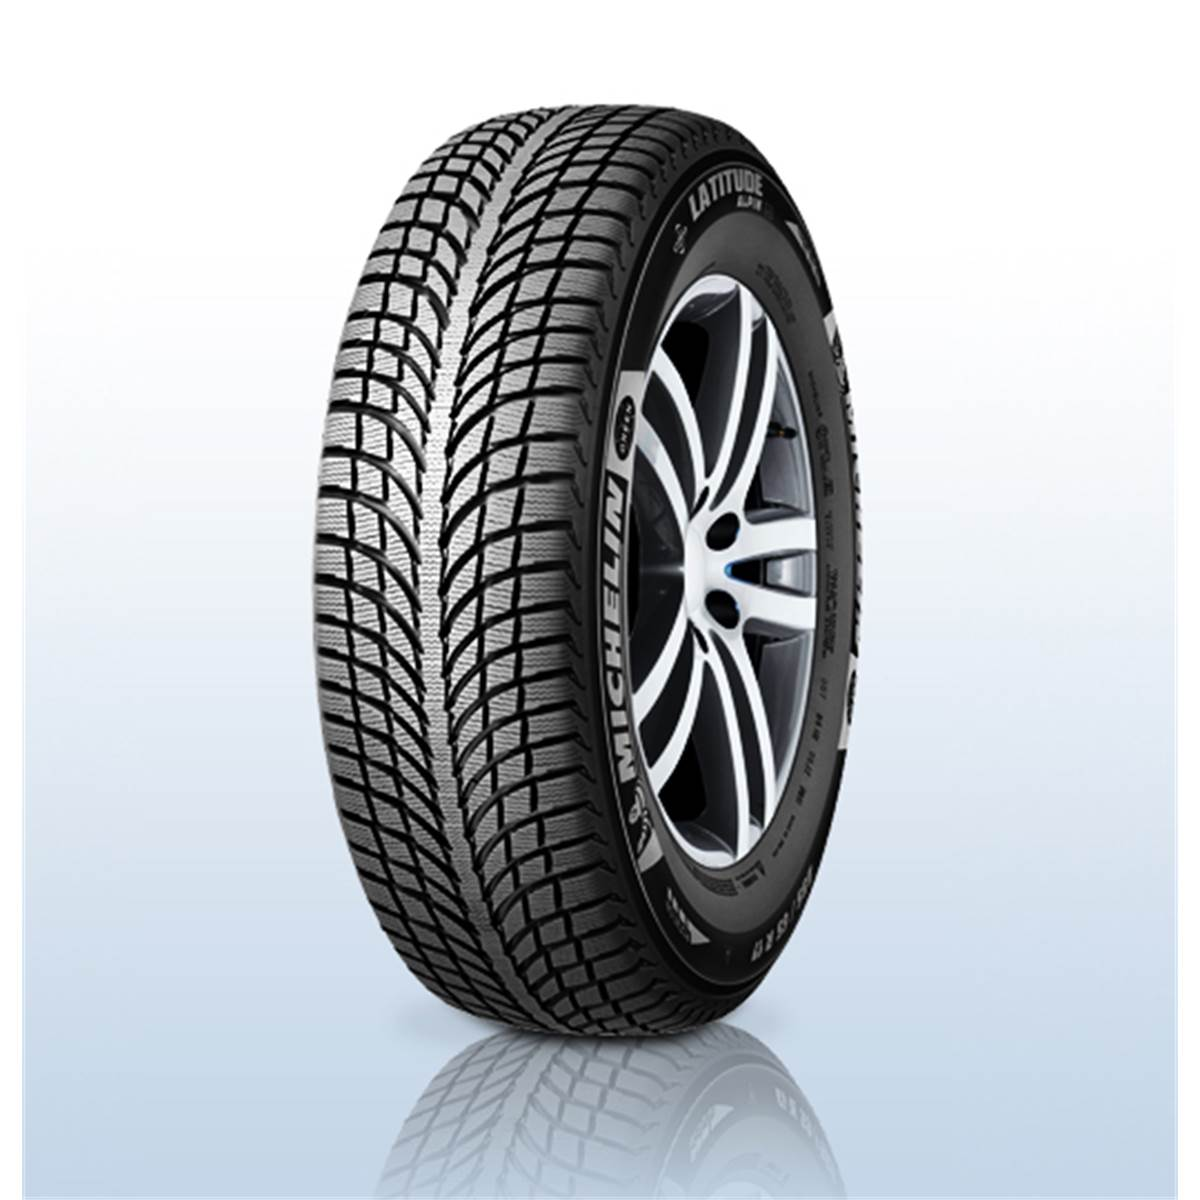 Michelin Latitude Alpin 2 XL pneu